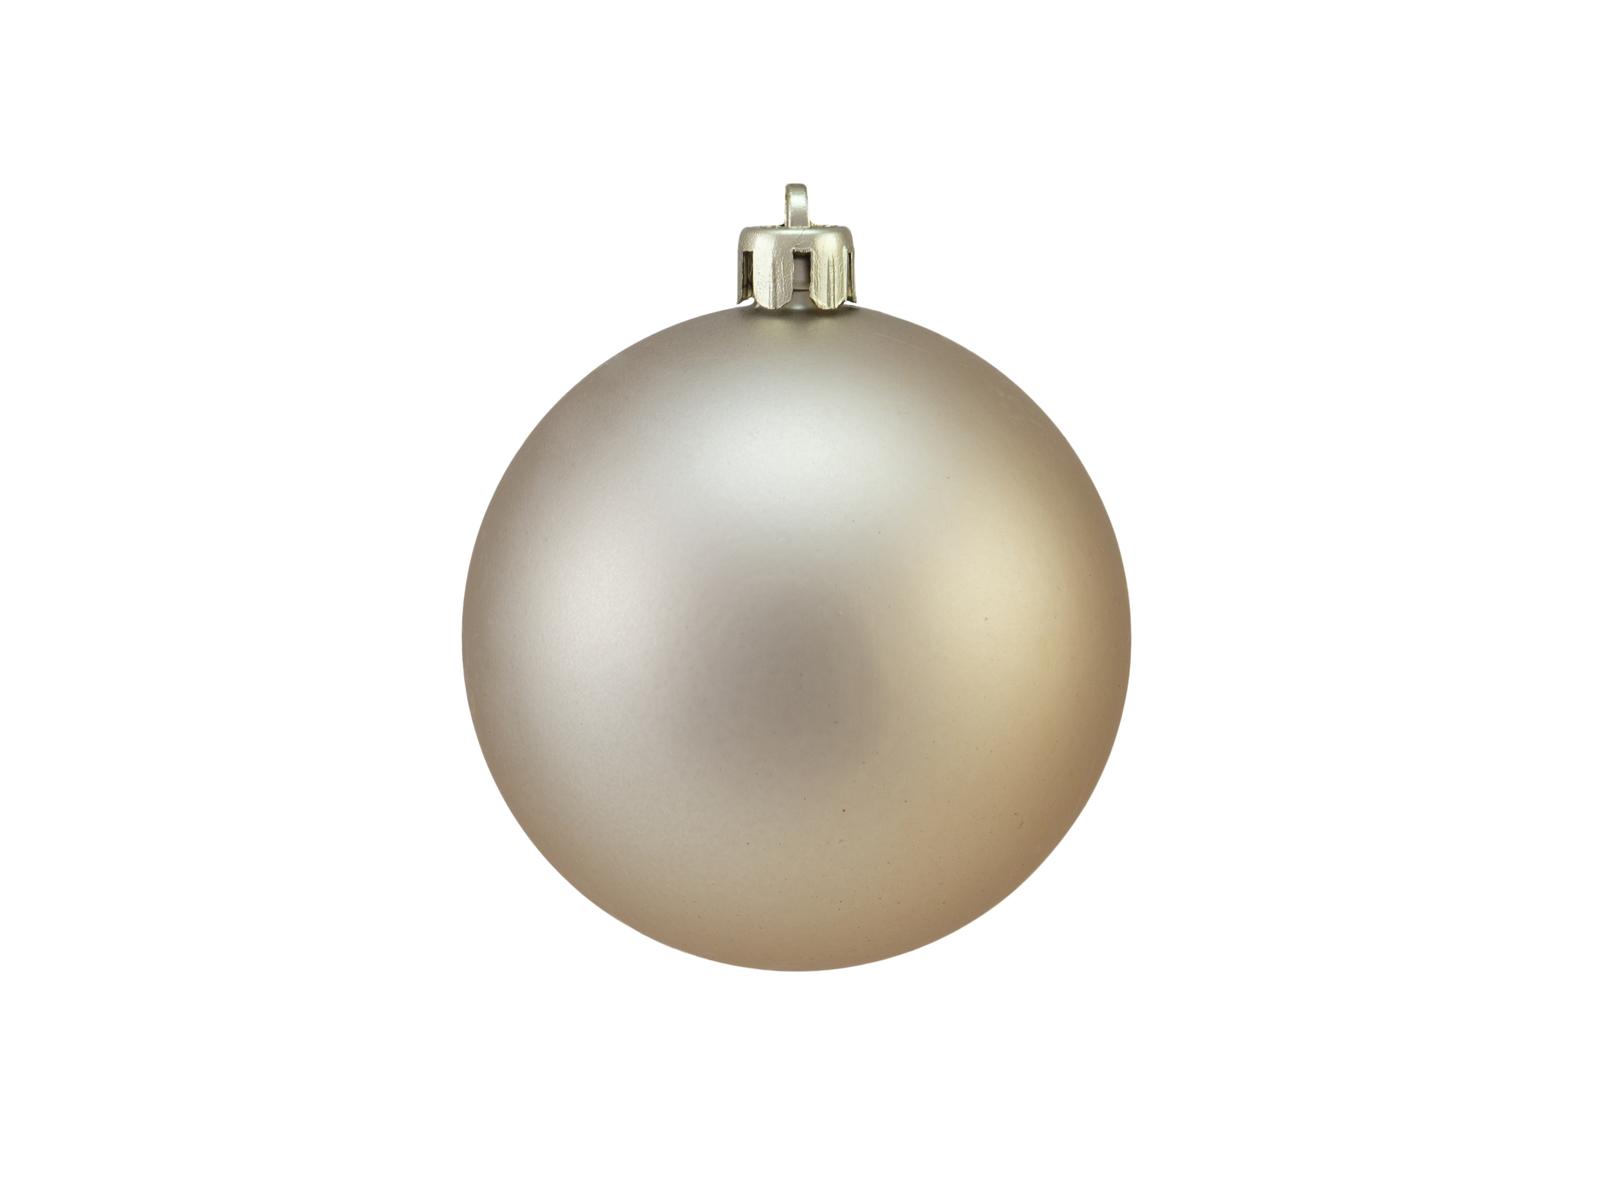 Balls Balls christmas plastic 7Cm for Tree decoration 6 pcs Copper metal